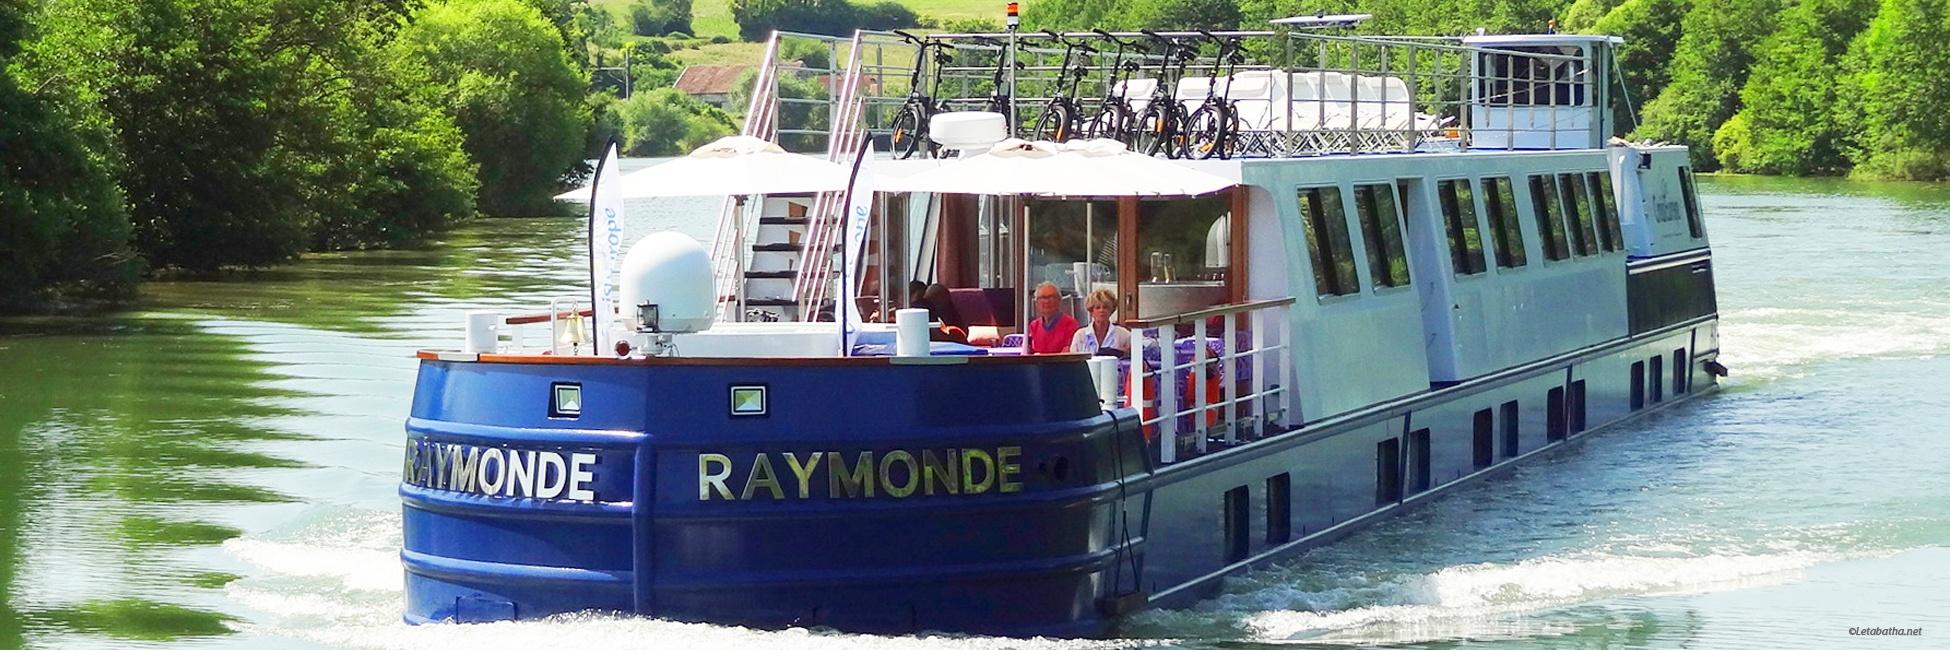 Péniche Raymonde en navigation